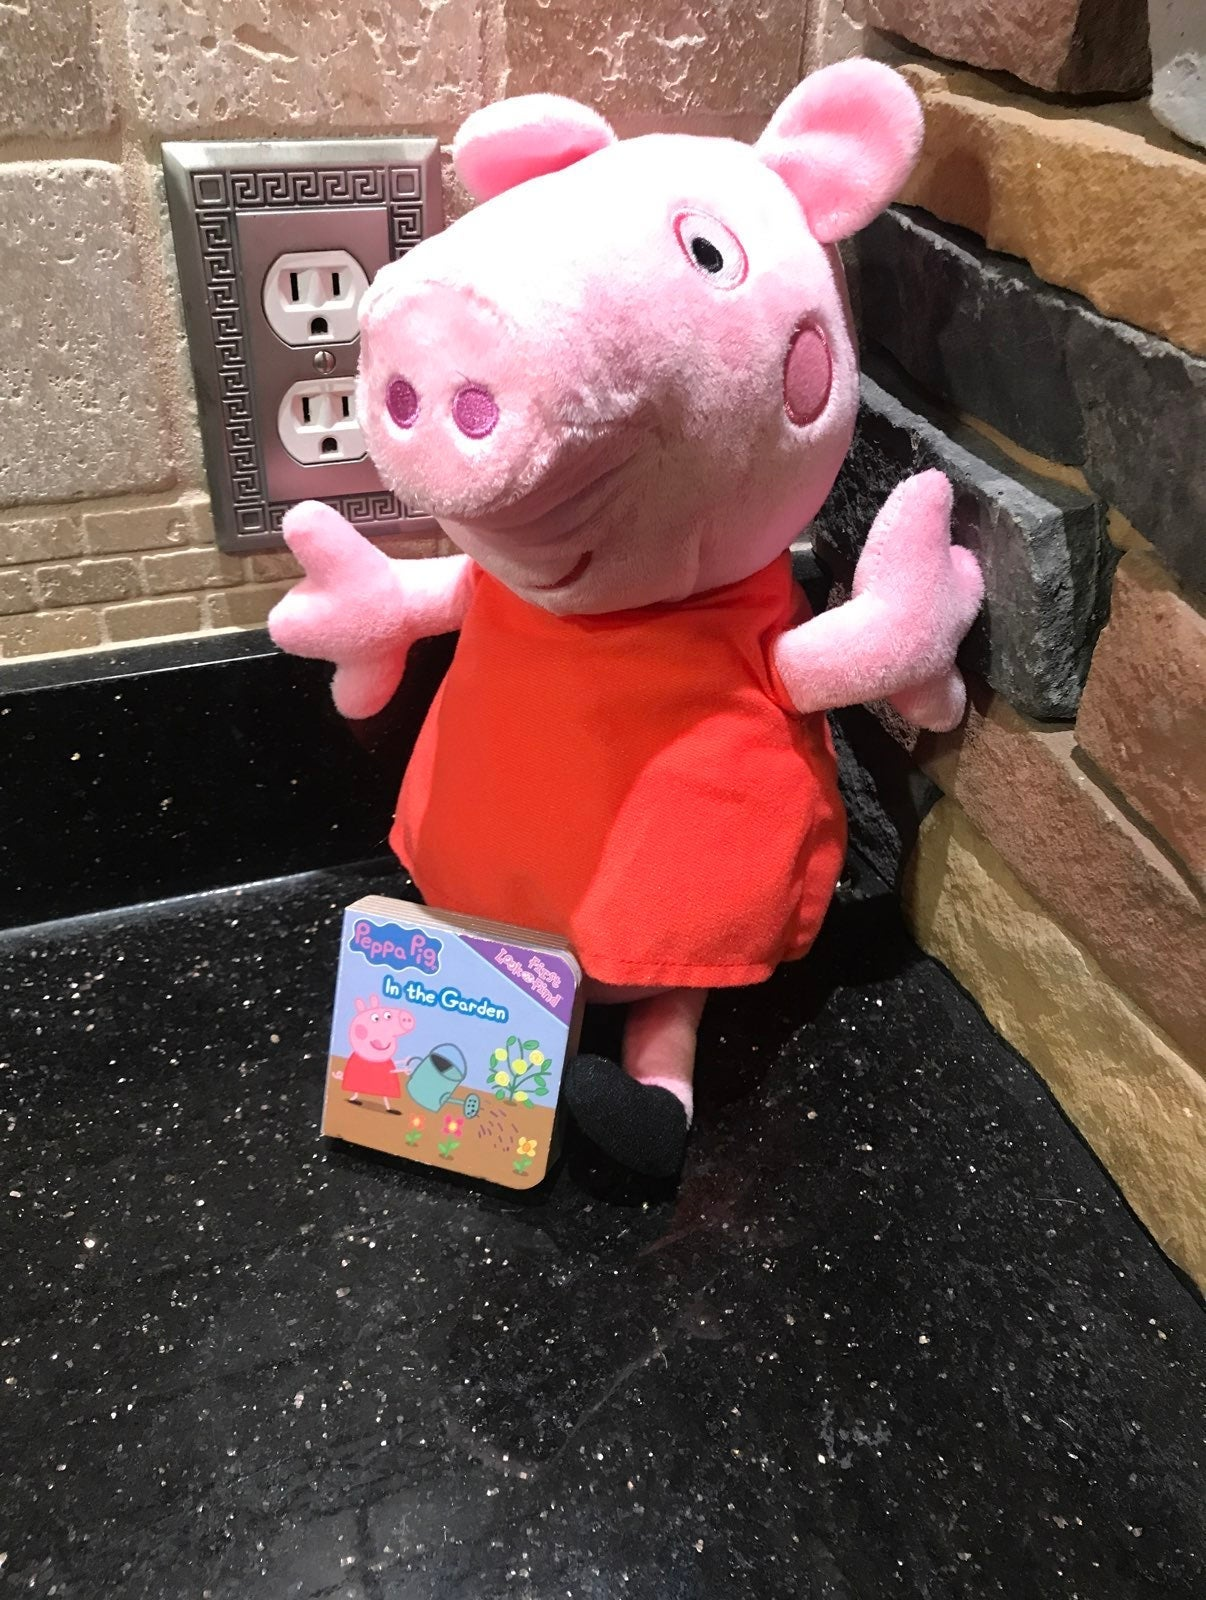 Peppa Pig Plush and book